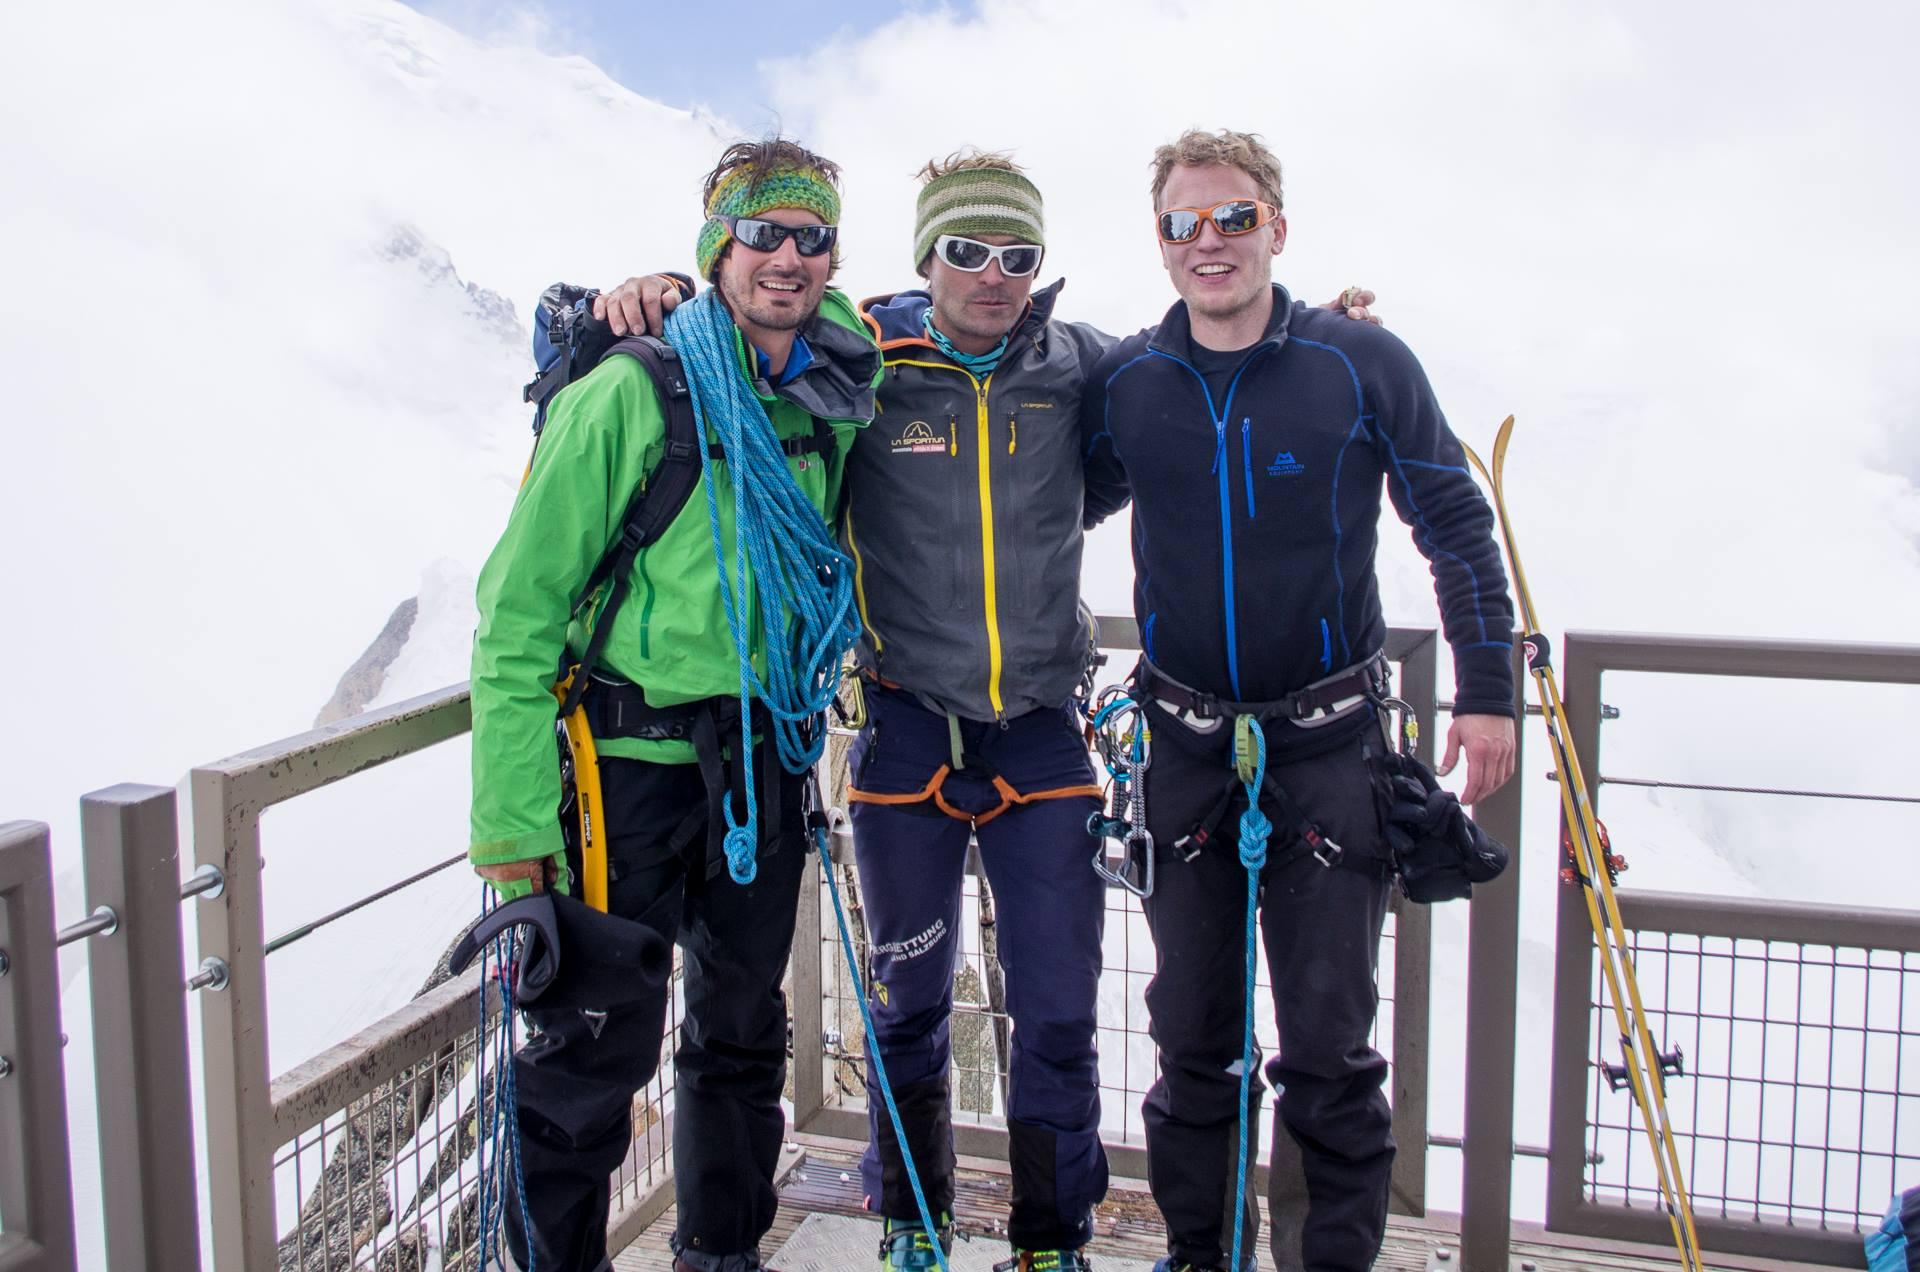 Klettersteig Chamonix : Chamonix eis und mixedtouren powder party bergsport e v